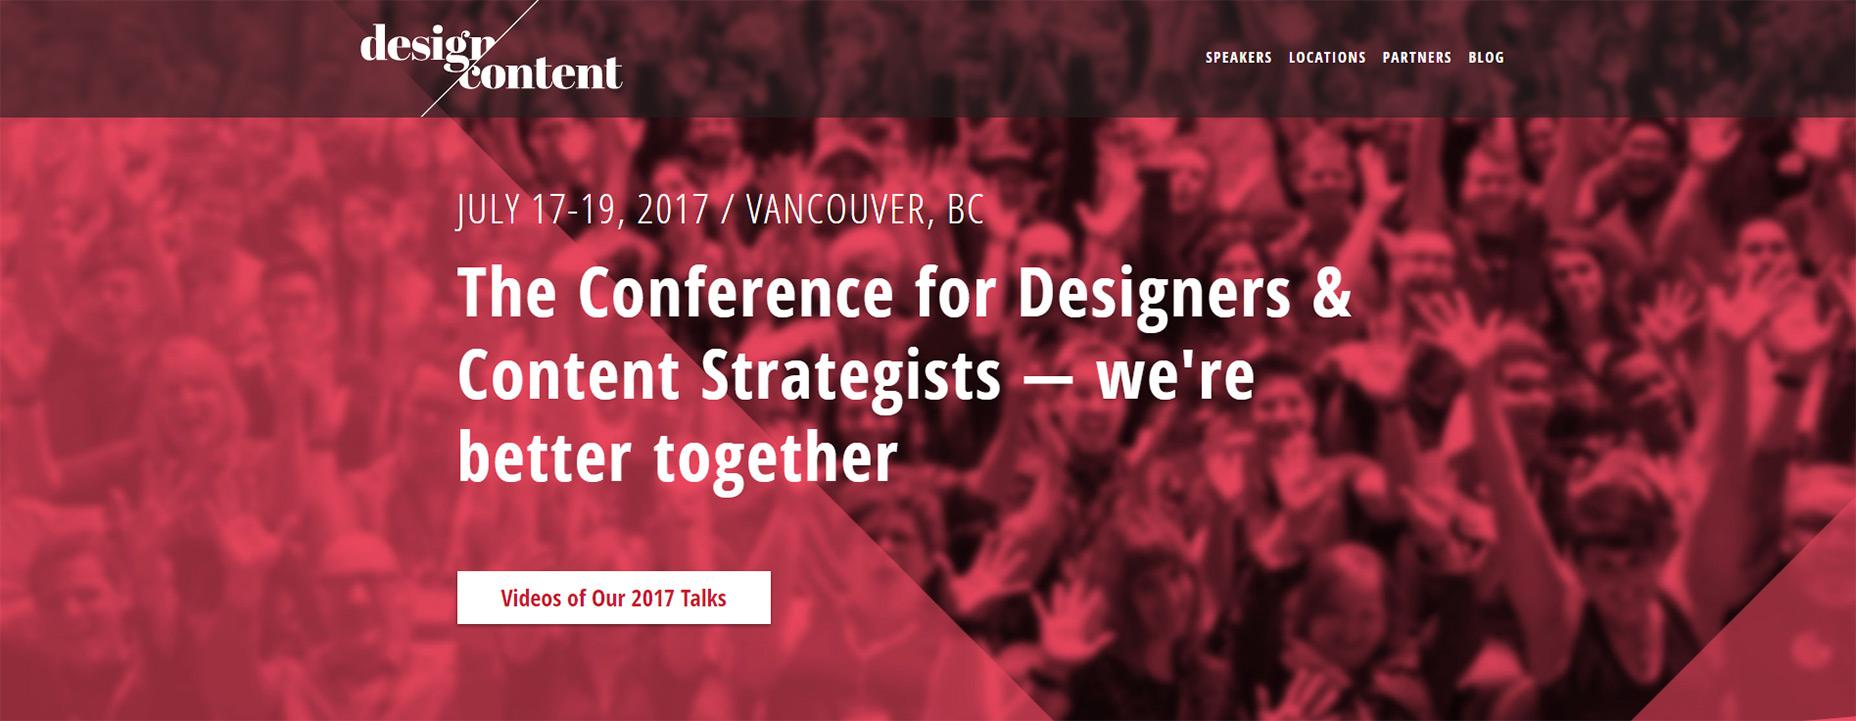 05-design-content-conference